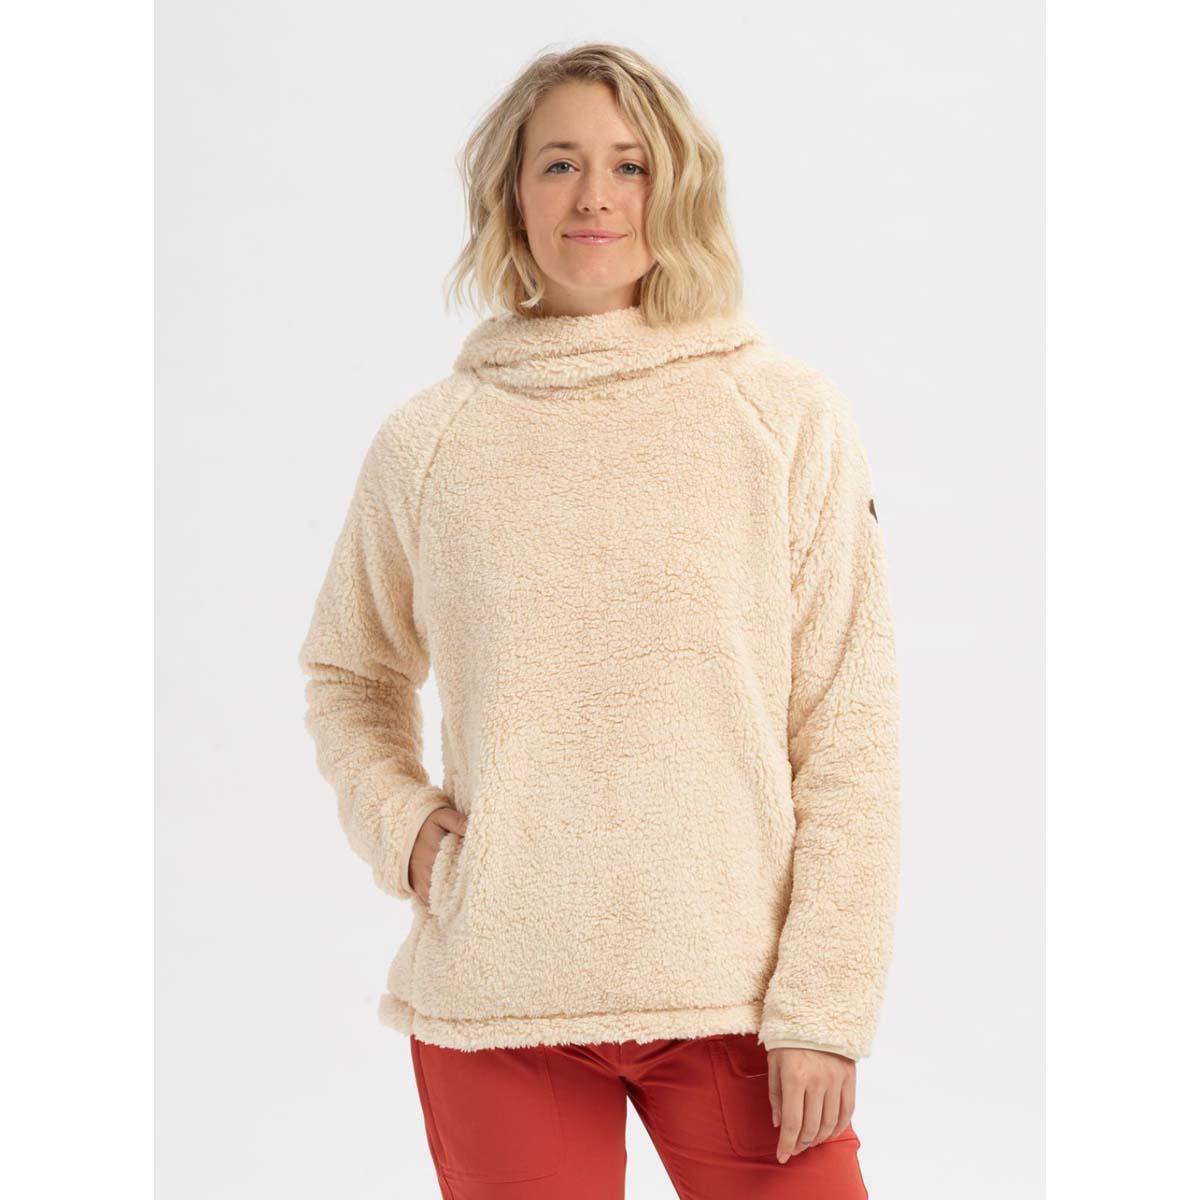 Hoodie Women's Fleece Pullover Lynx Burton hdtsQrCx